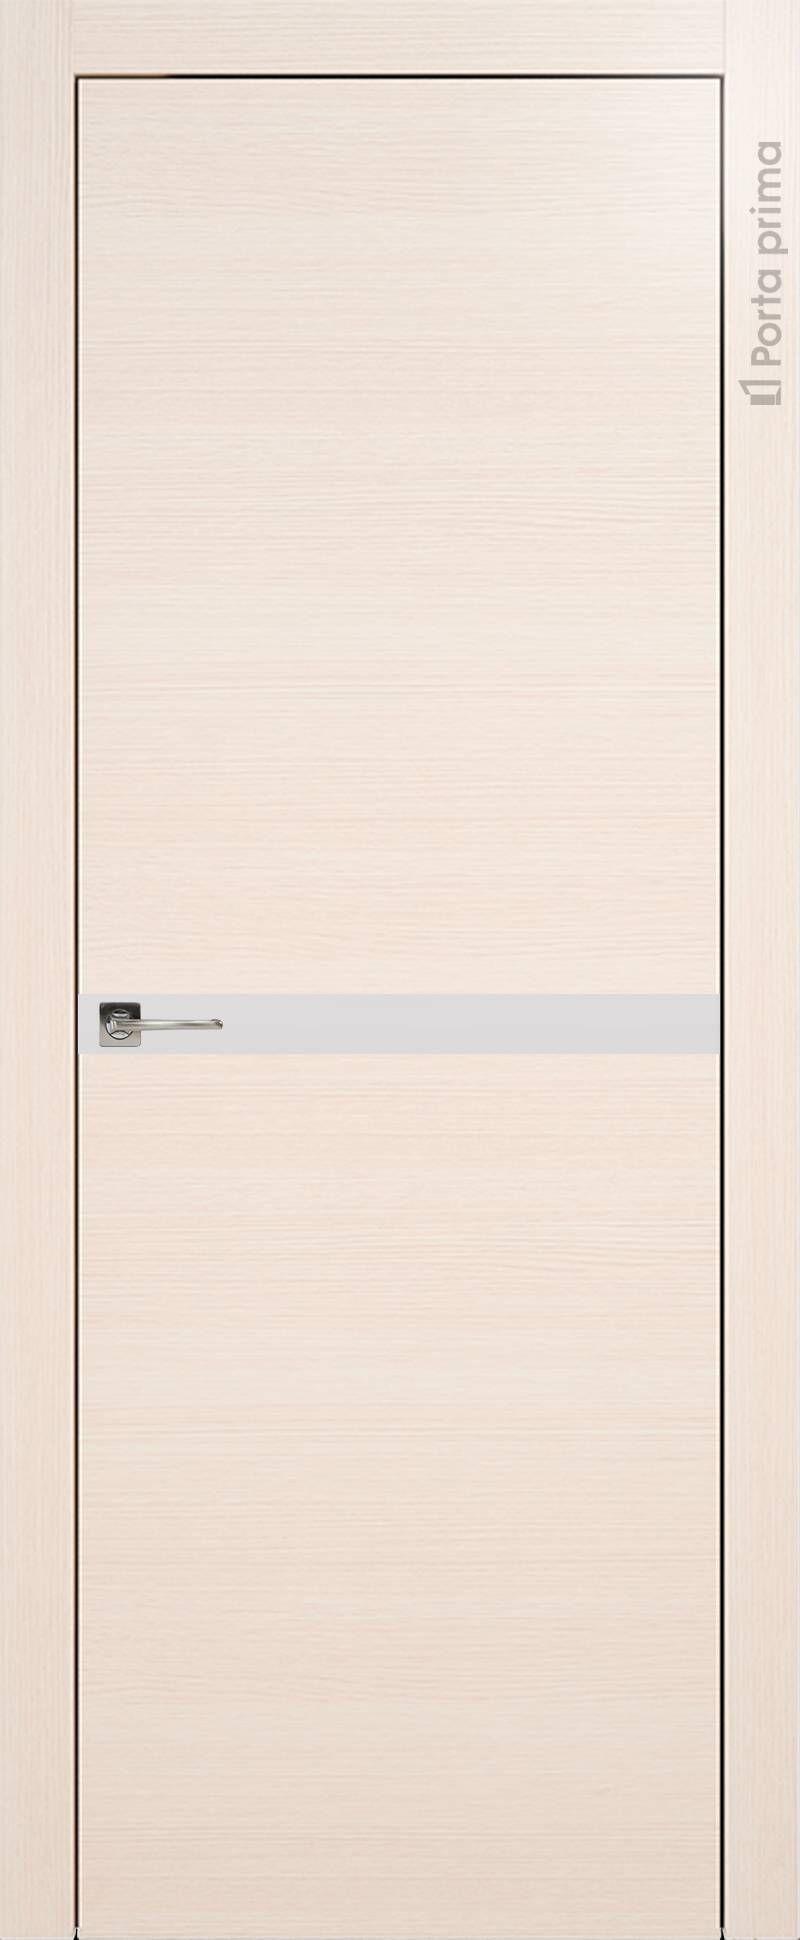 Tivoli Б-4 цвет - Беленый дуб Без стекла (ДГ)